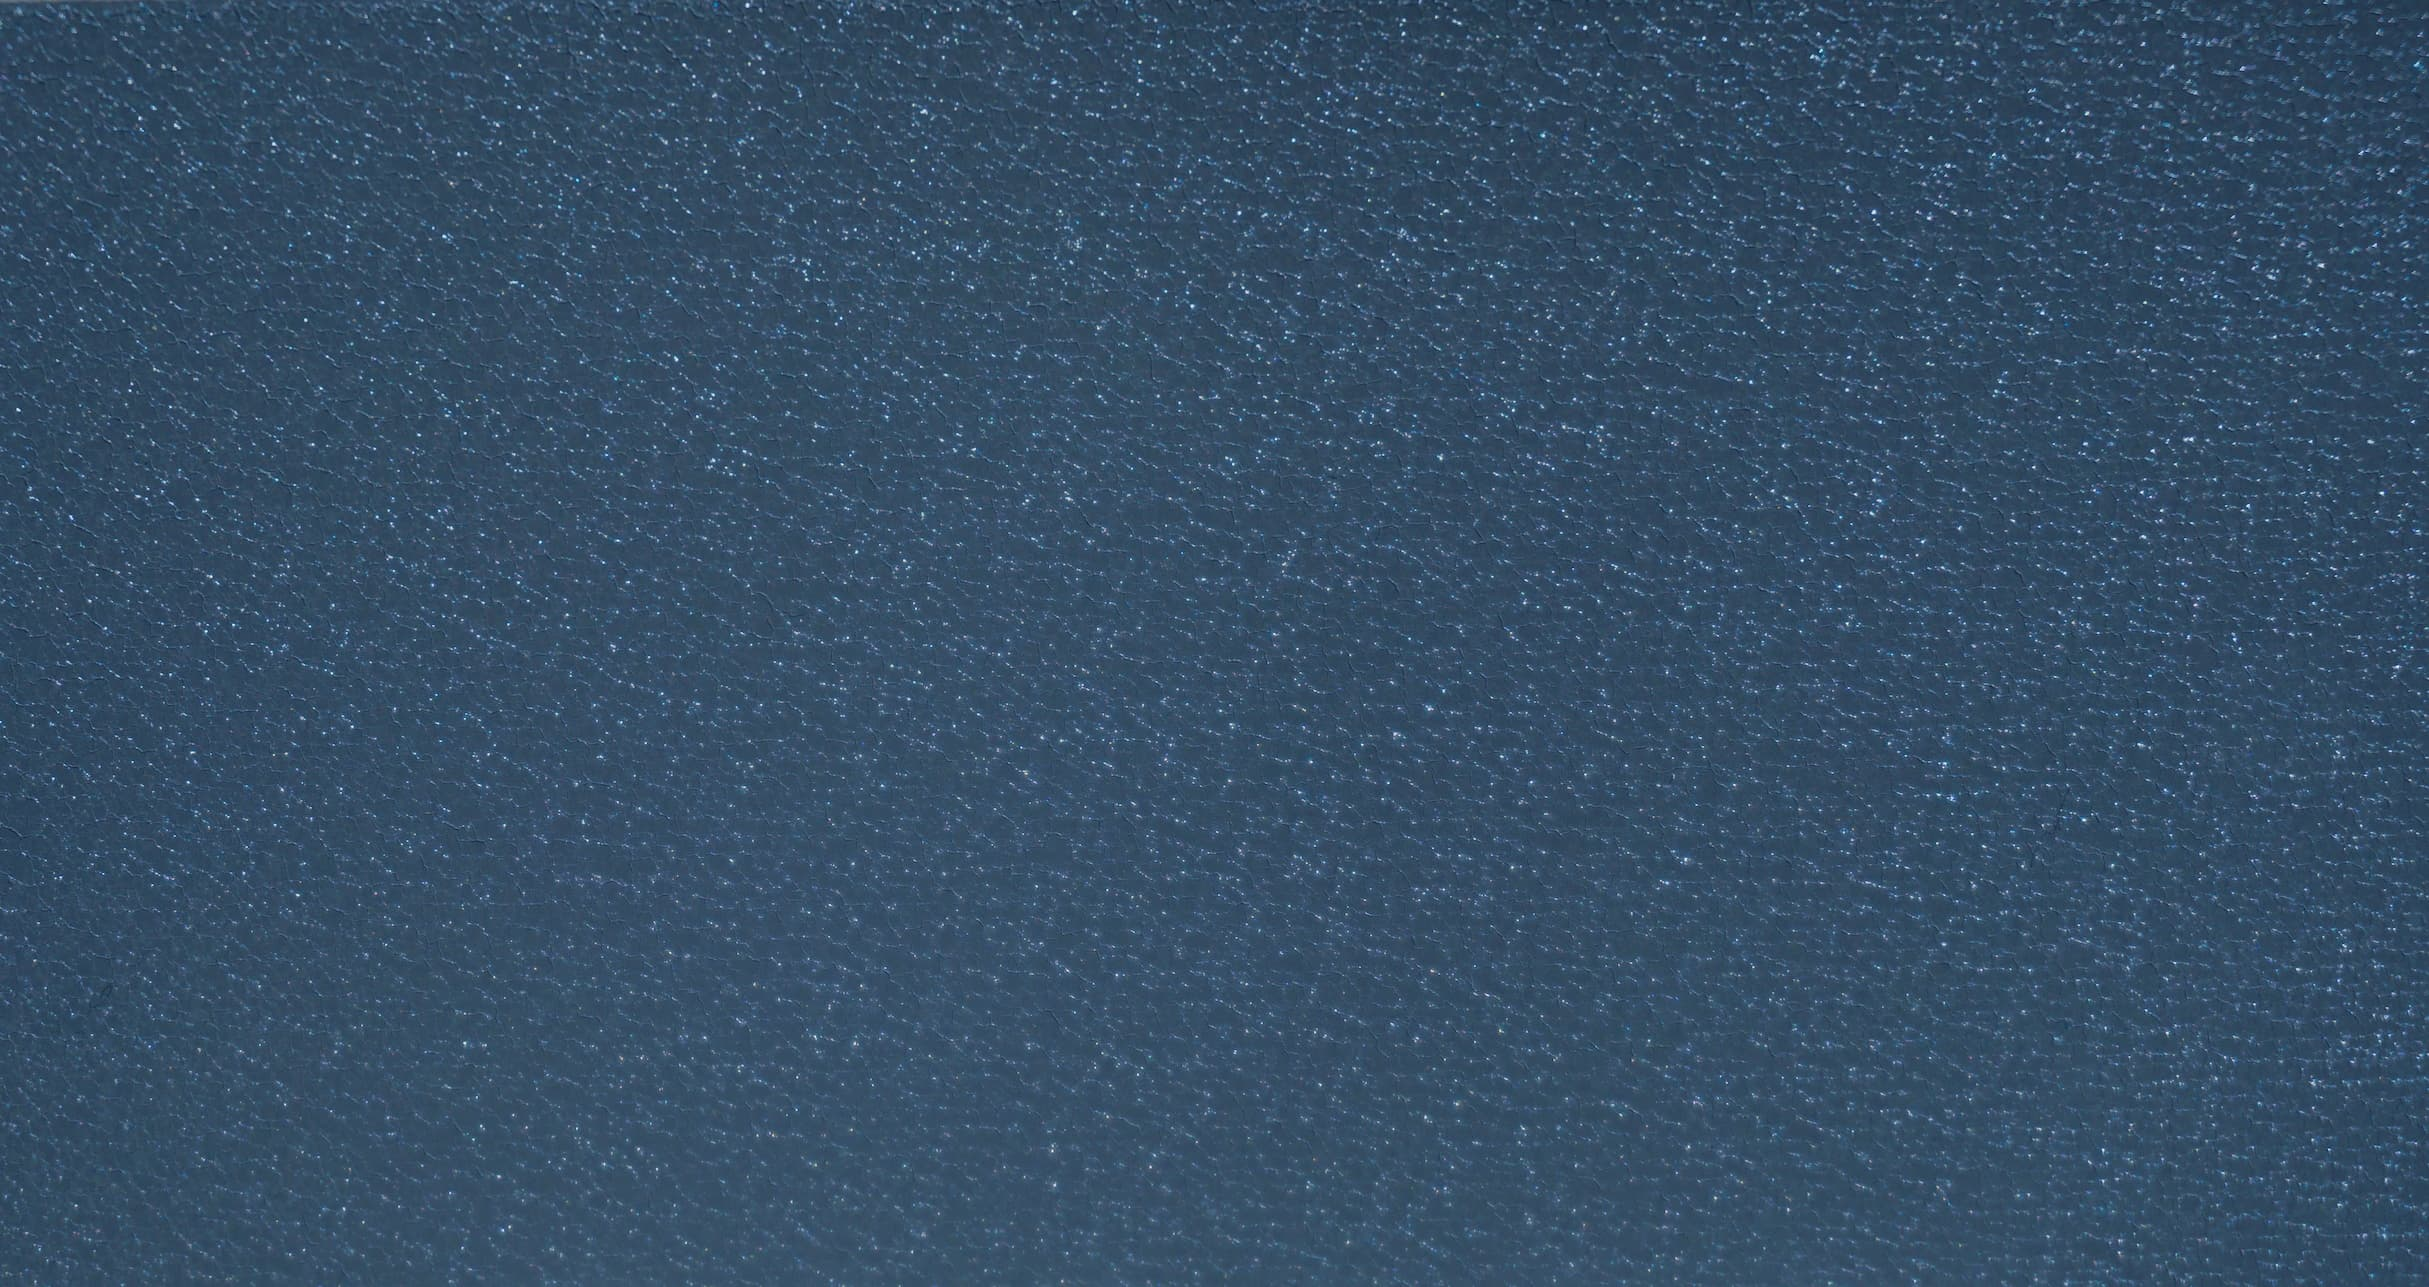 Textured gallery blue